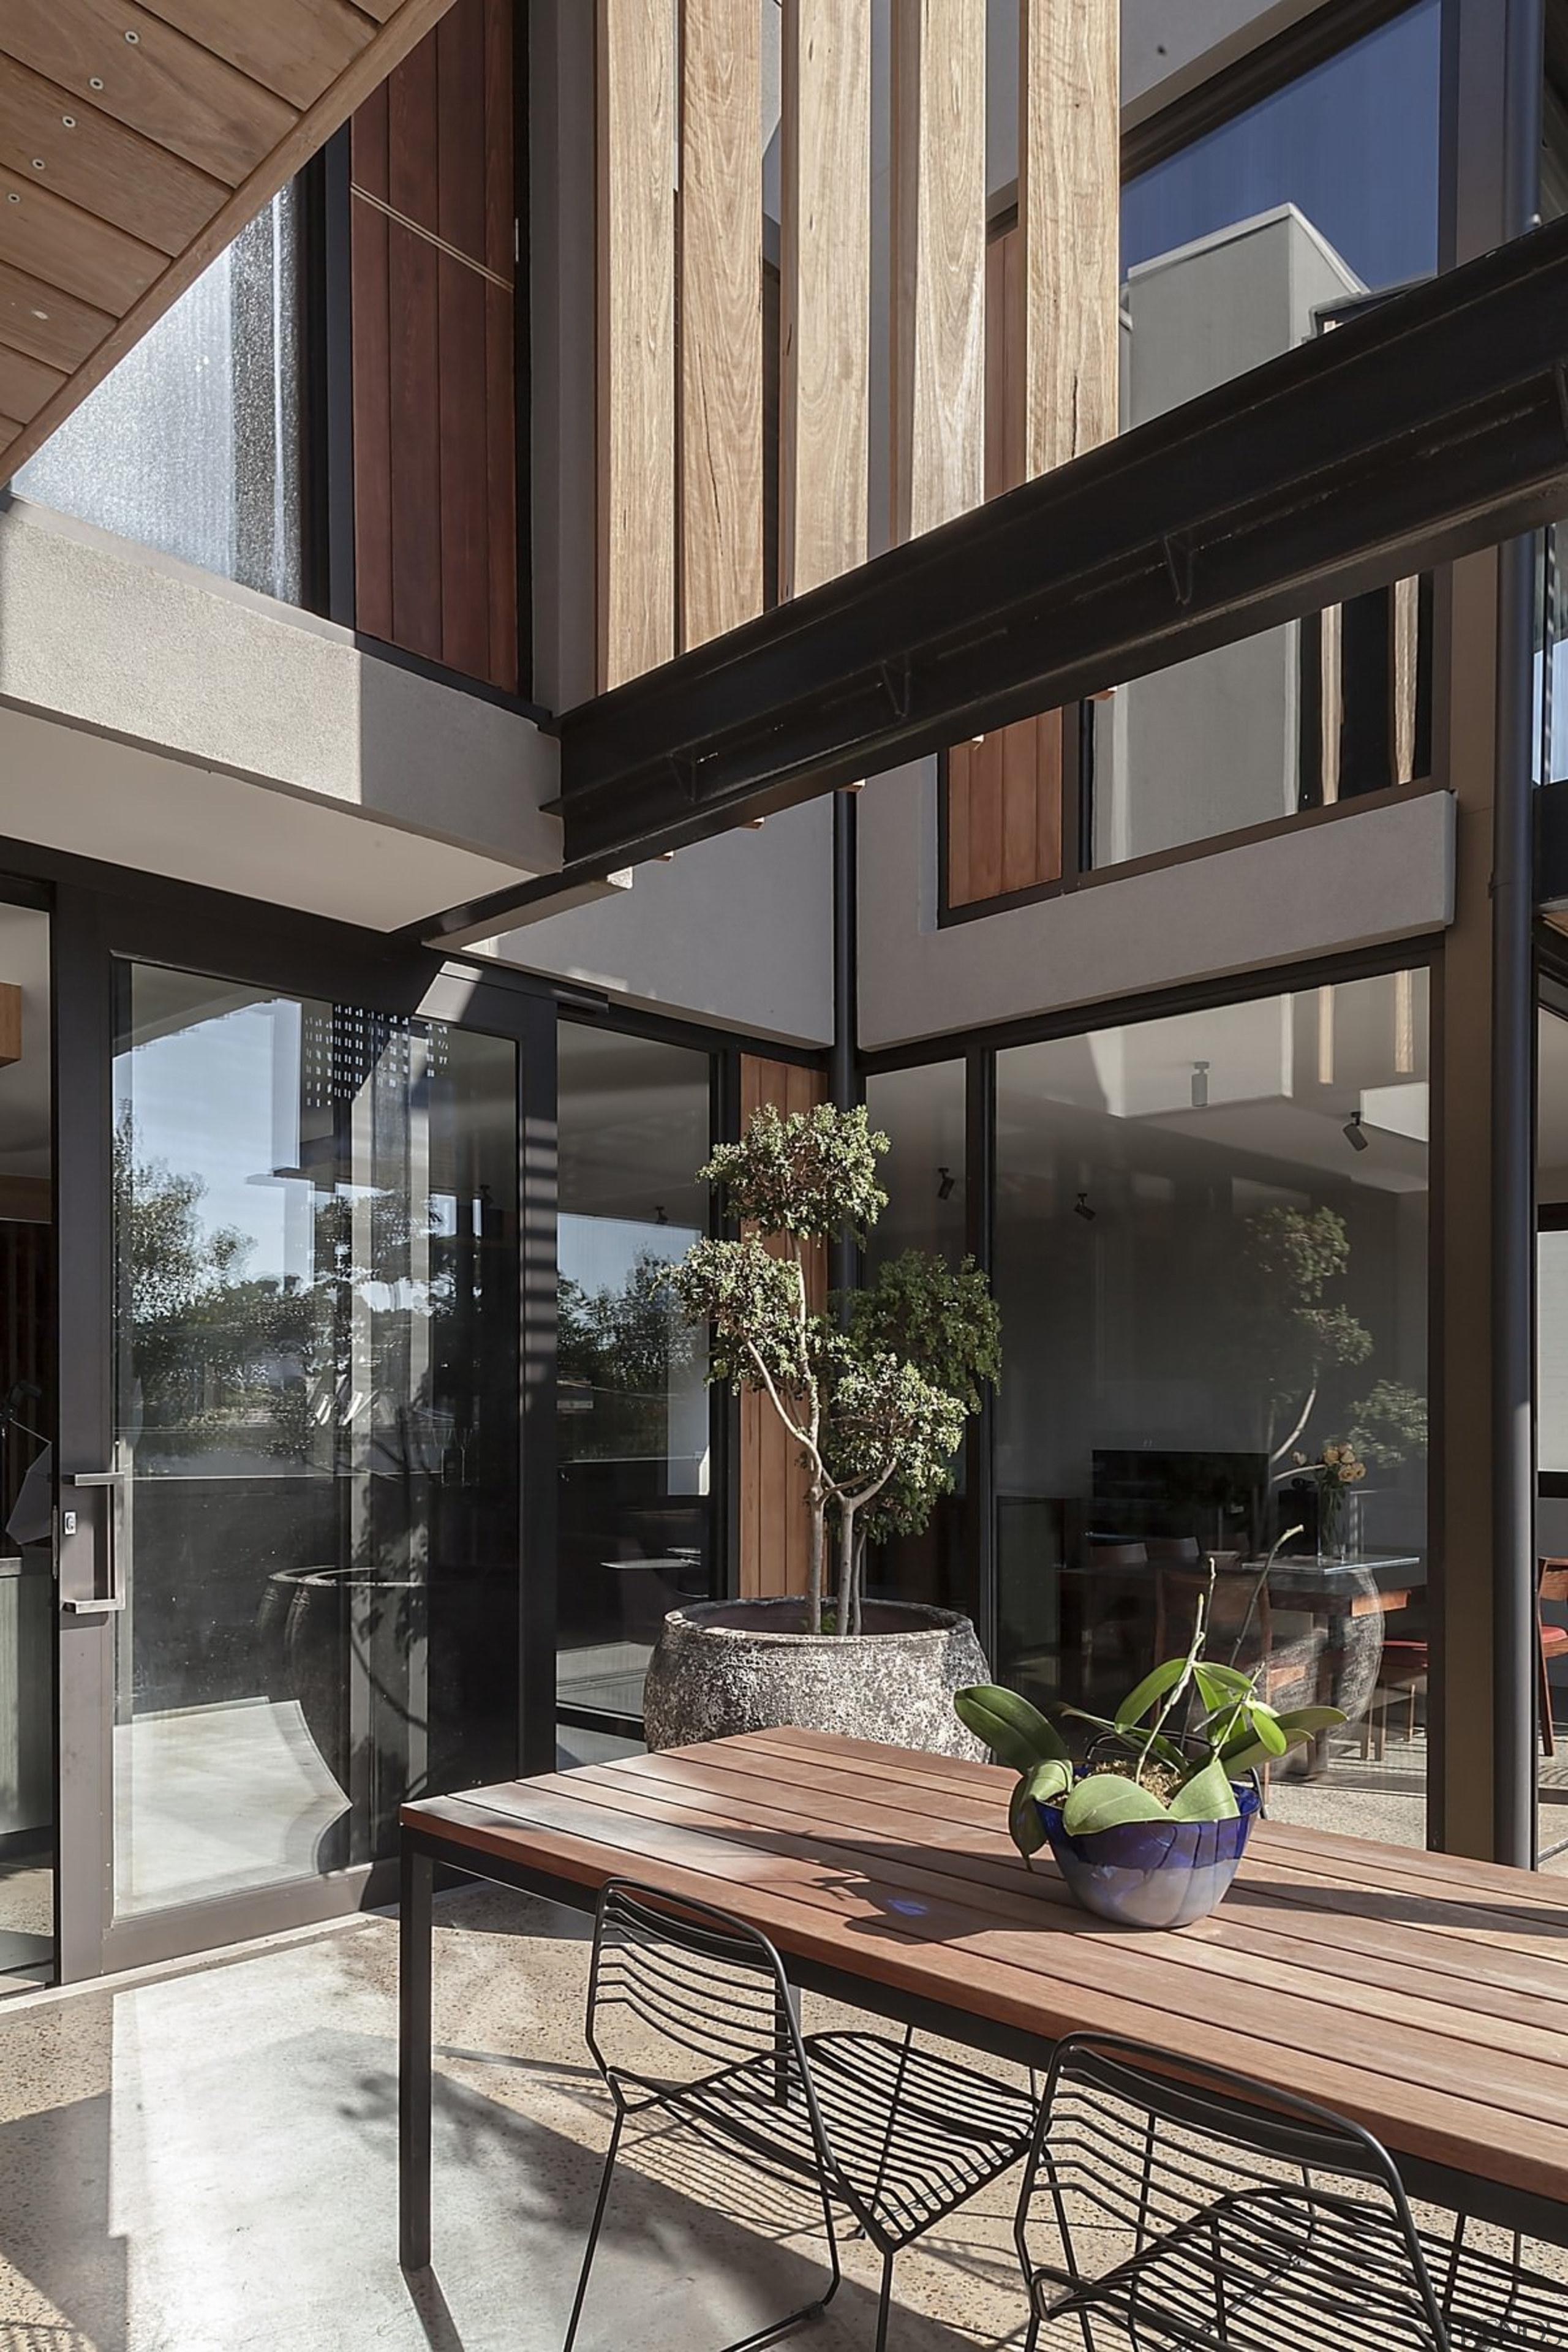 Architect: mcmahon and nerlich architectsPhotography by superk apartment, architecture, condominium, courtyard, home, house, interior design, window, black, gray